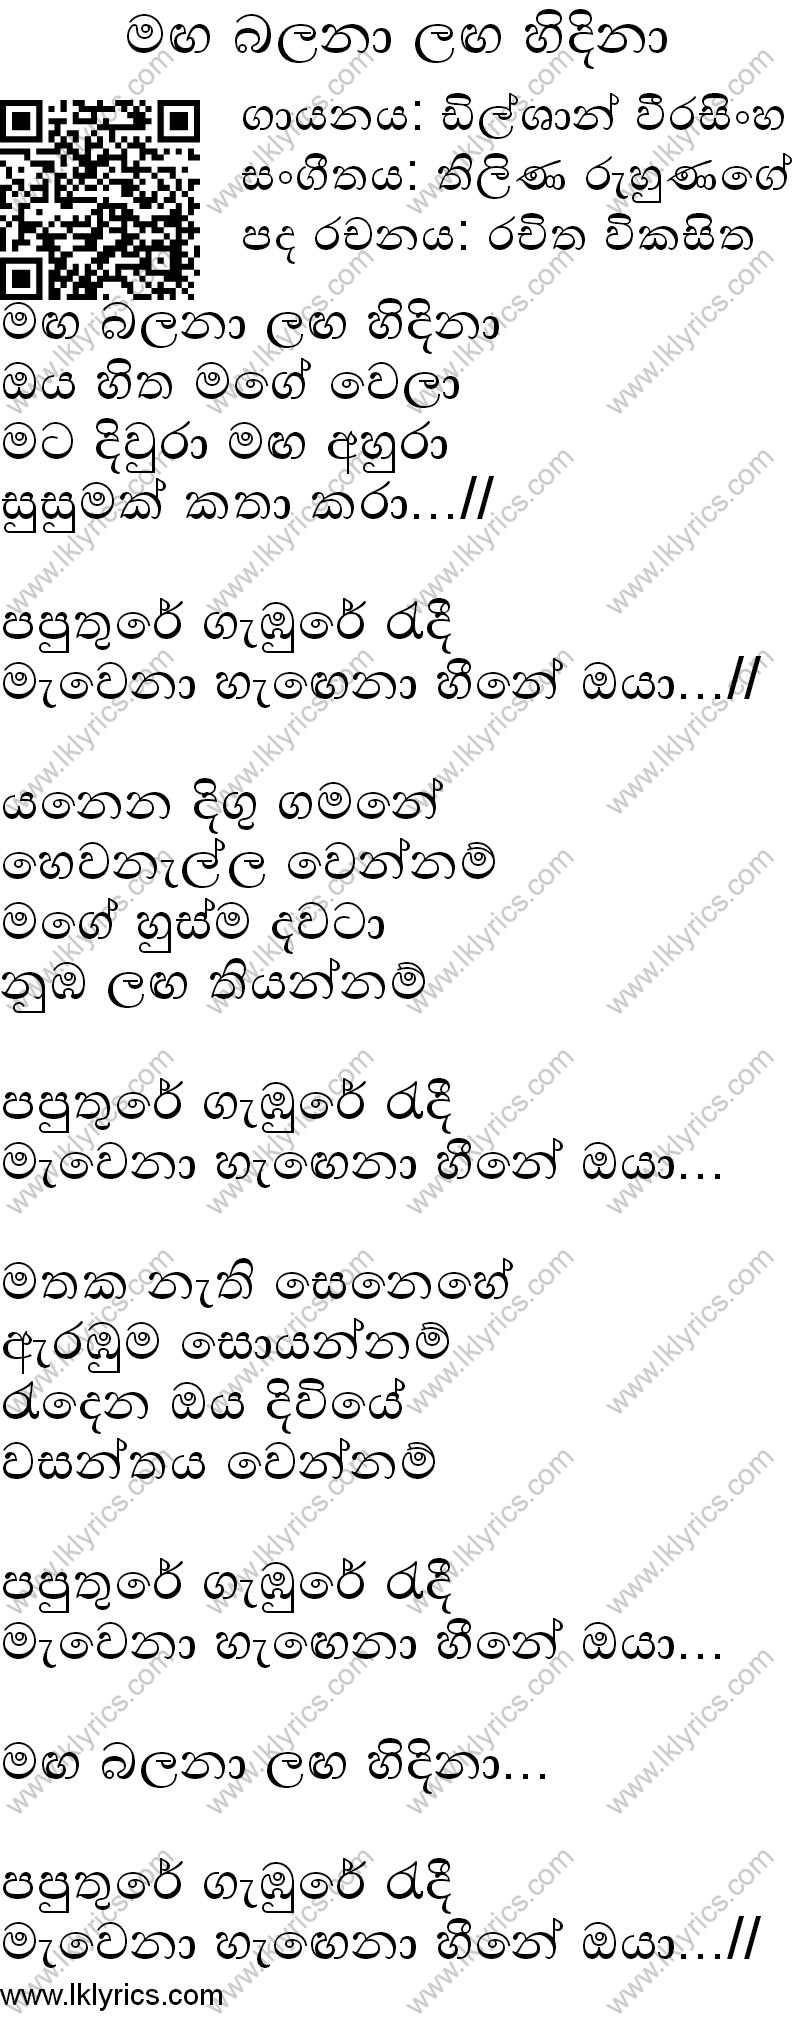 maga balana langa hindina song